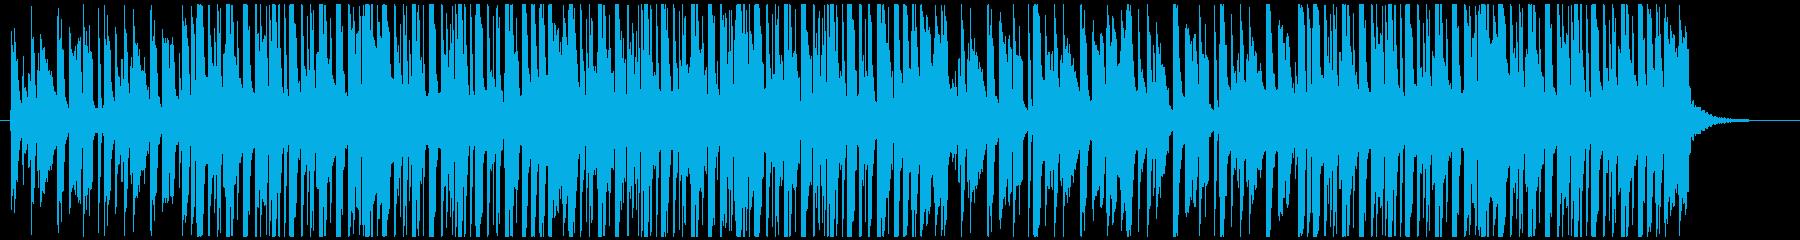 Hip Hop Background の再生済みの波形